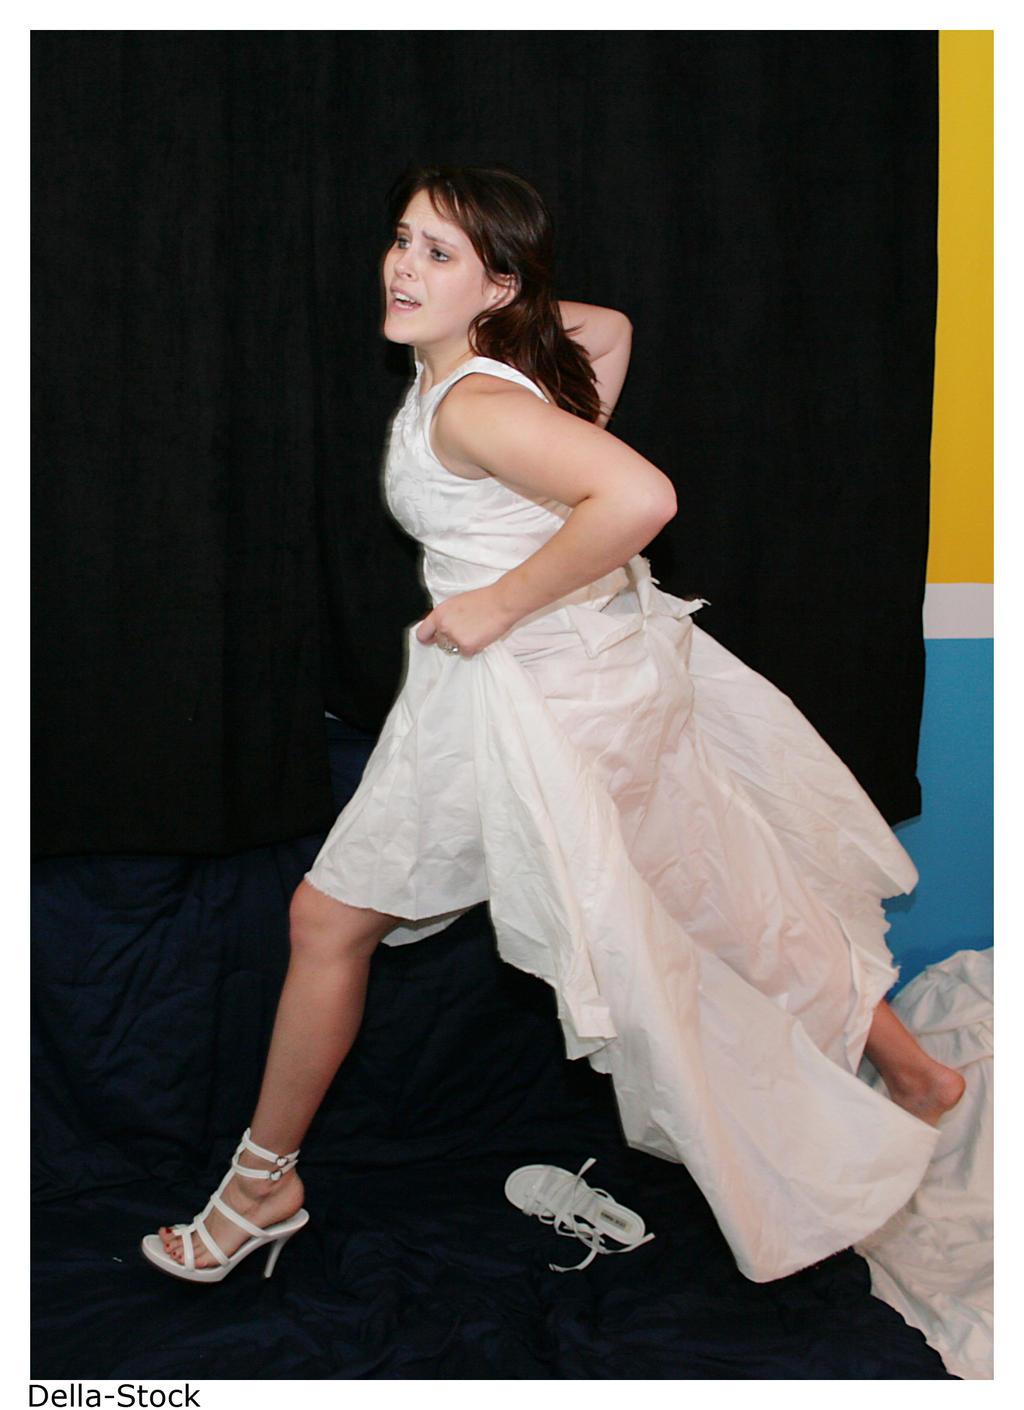 Cinderella: Running Away by Della-Stock